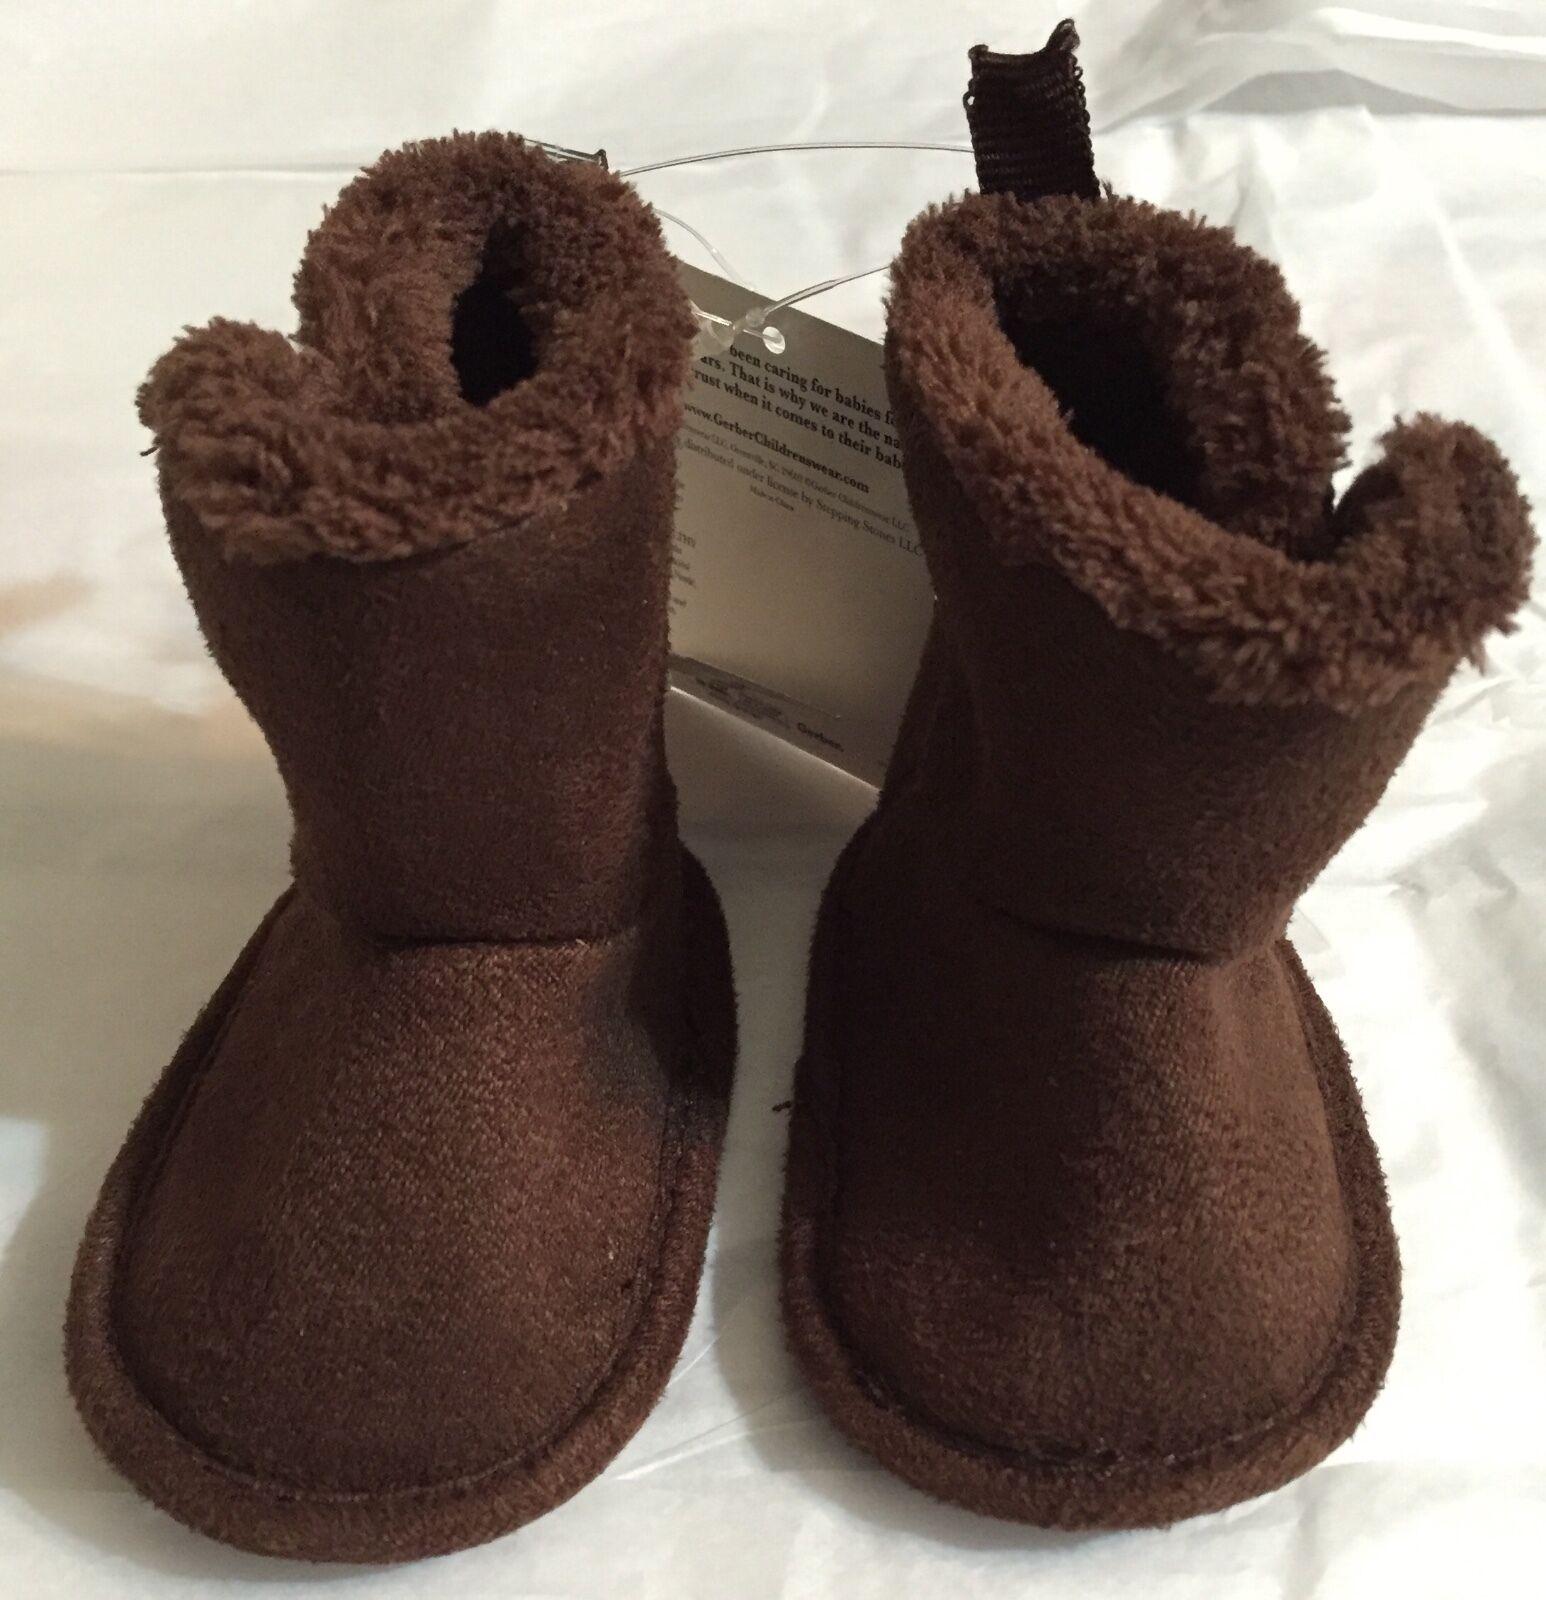 New Gerber 0-3 months Baby Boys Girls Winter Brown Boots Siz